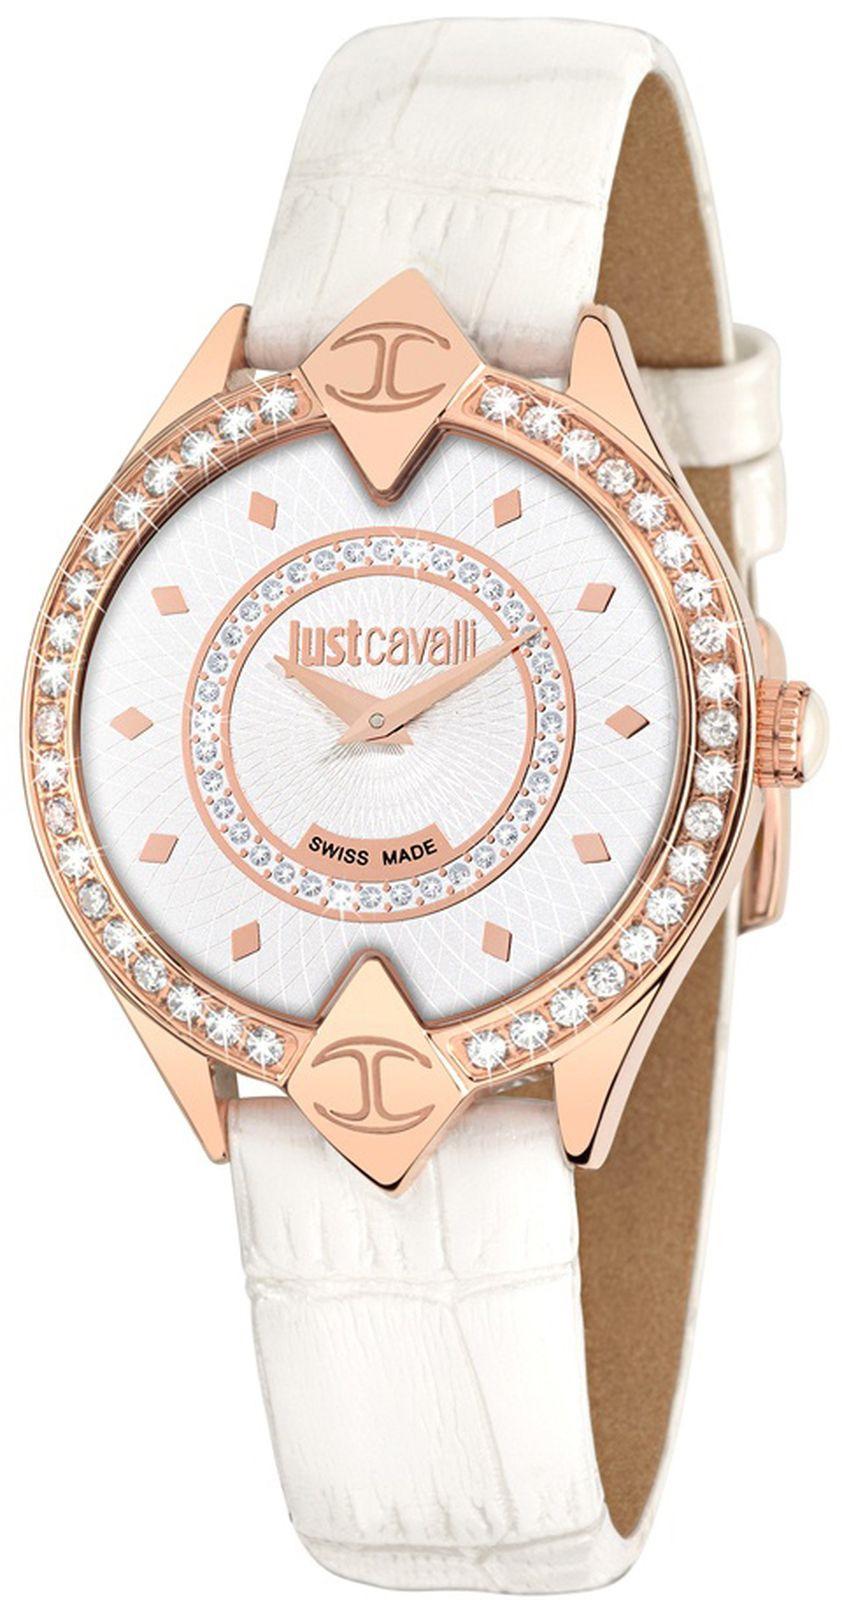 Наручные часы Just Cavalli женские, белый все цены